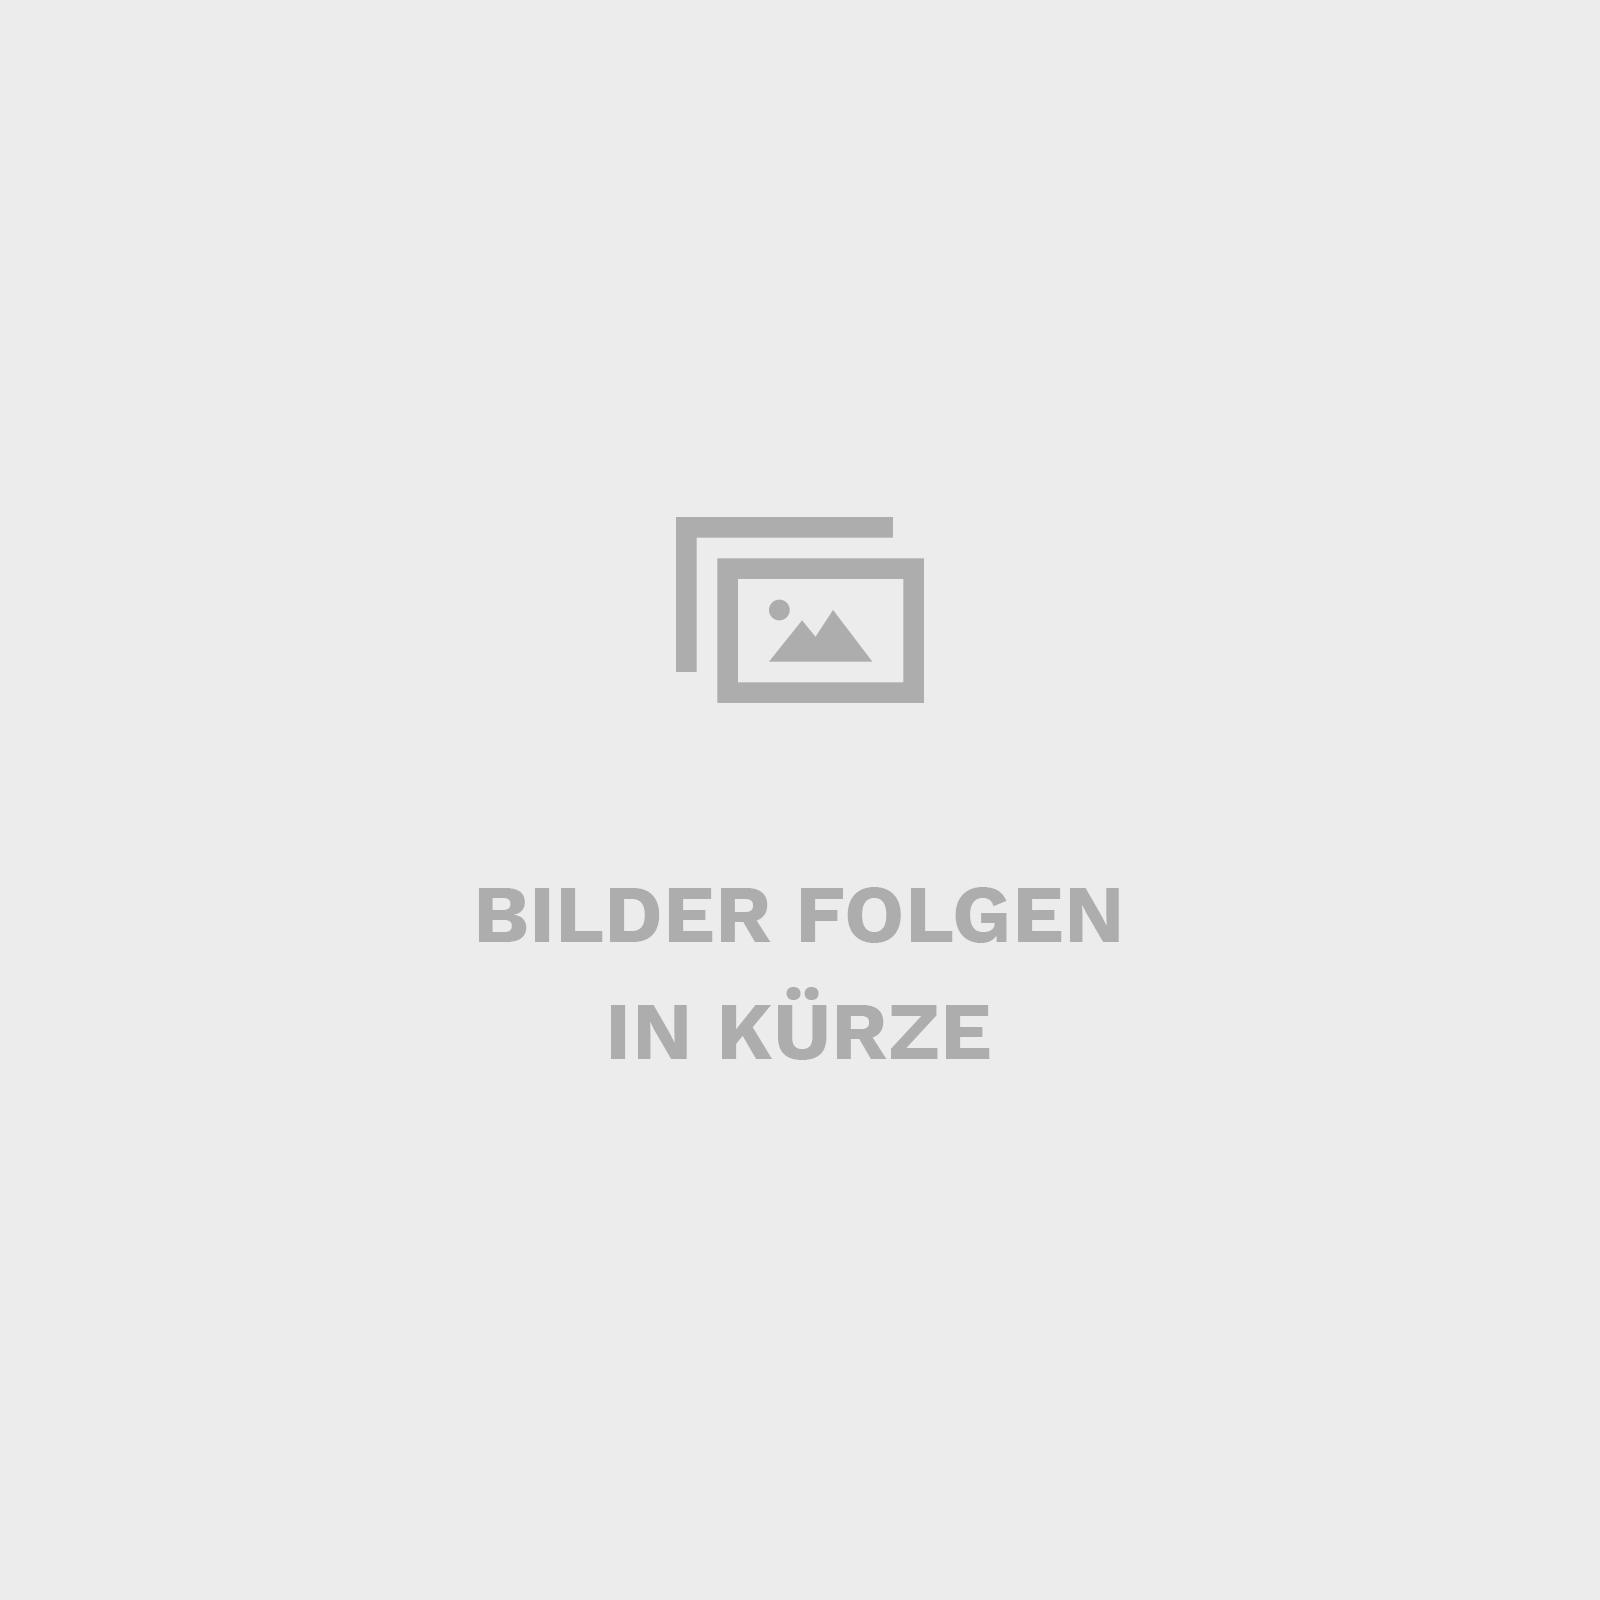 Max. Wall LED - als Wandleuchte